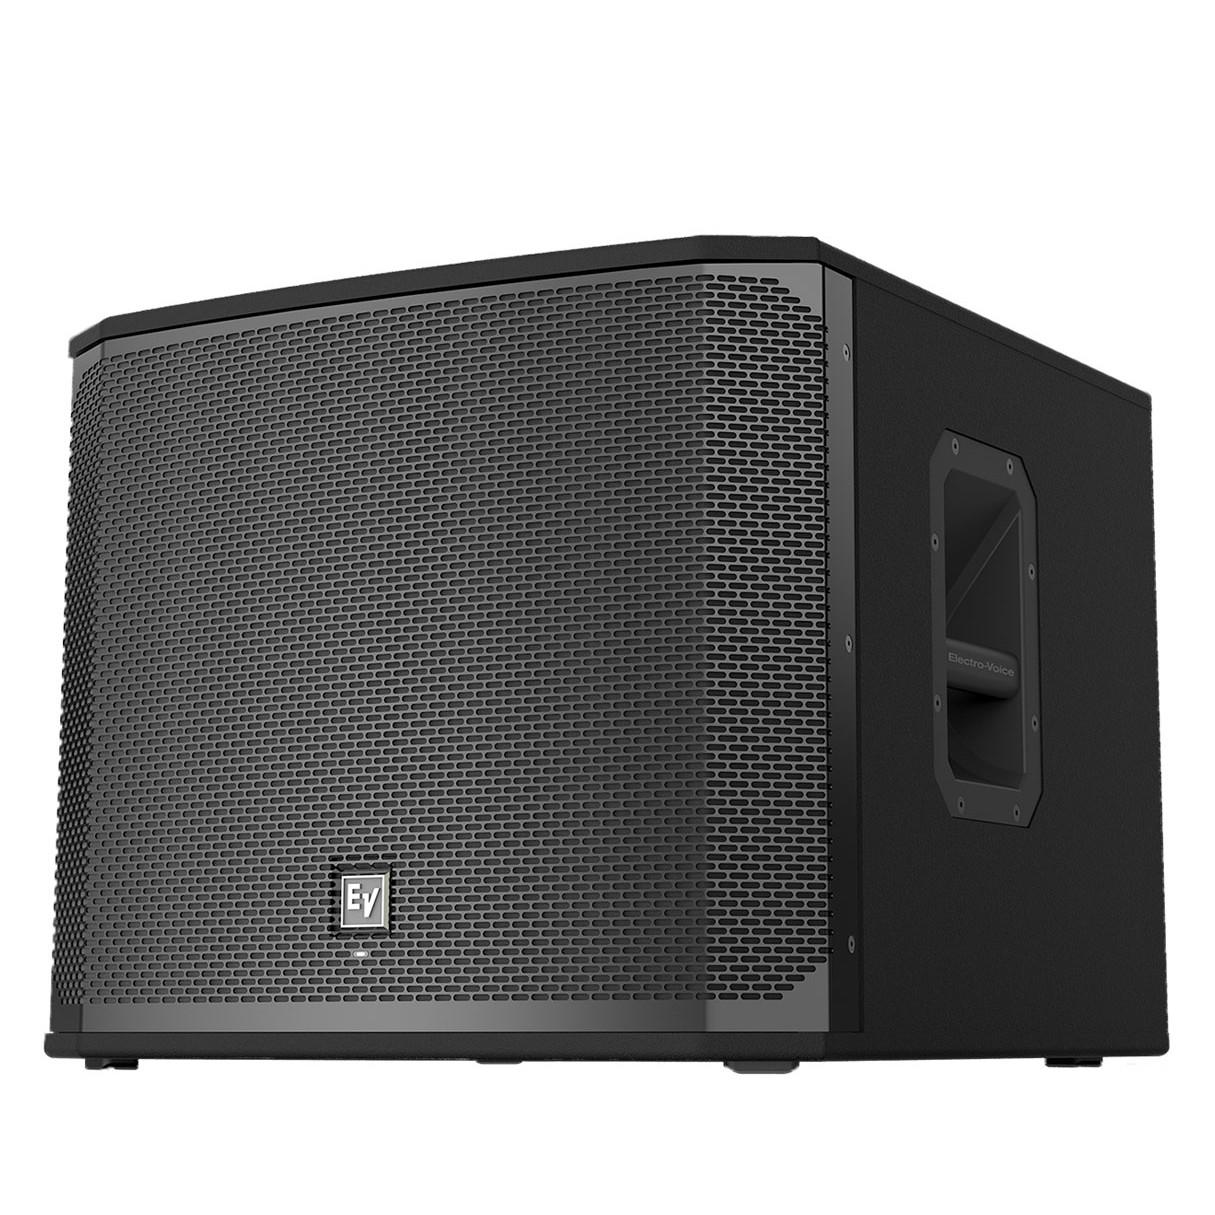 electro voice ekx 18sp pole mogami. Black Bedroom Furniture Sets. Home Design Ideas